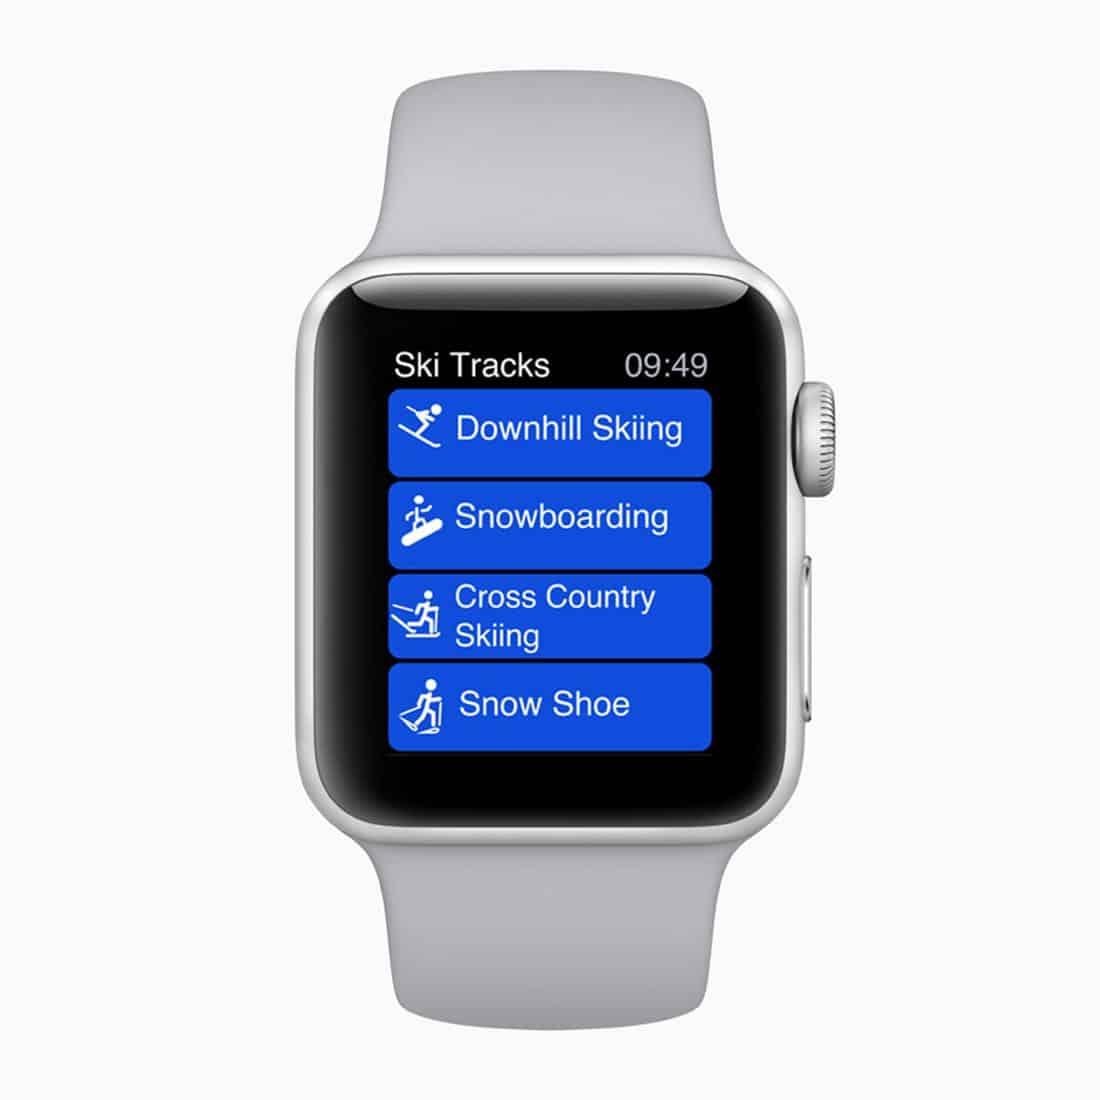 Apple Watch Series 3 ski tracks 20282018